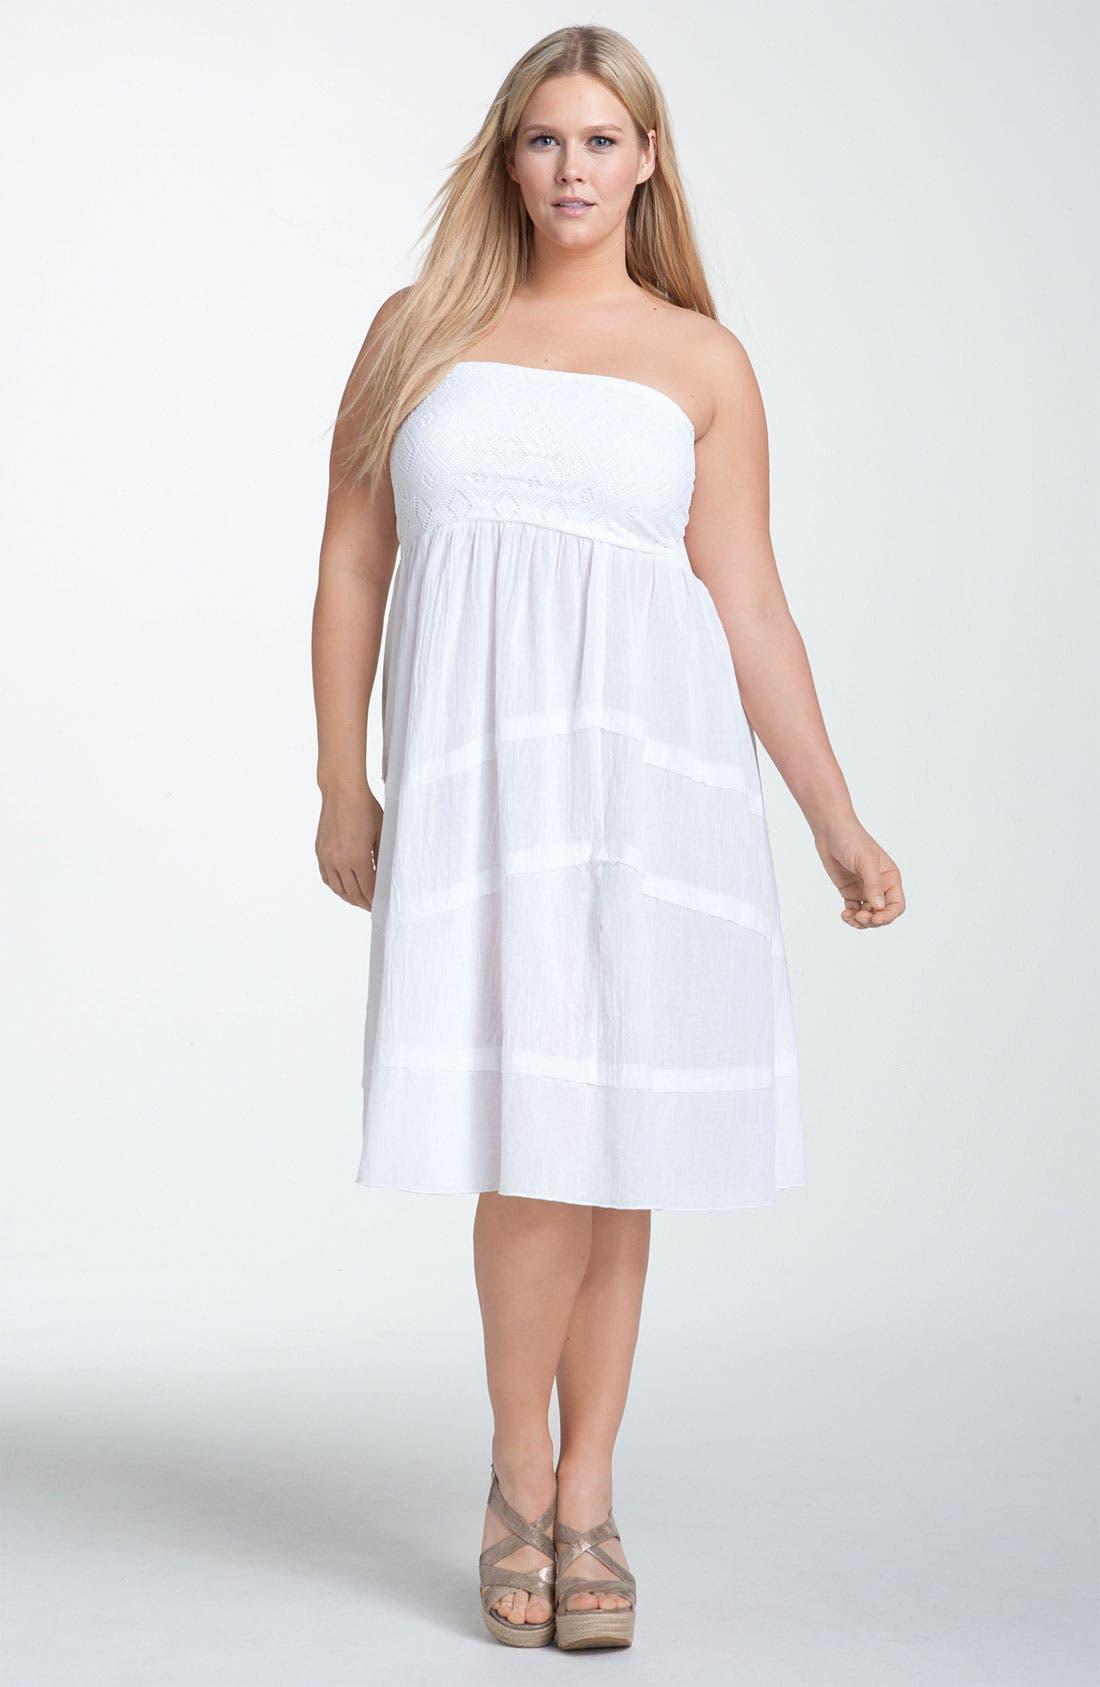 Main Image - Becca 'Lighten Up' Convertible Cover-Up Dress (Plus)